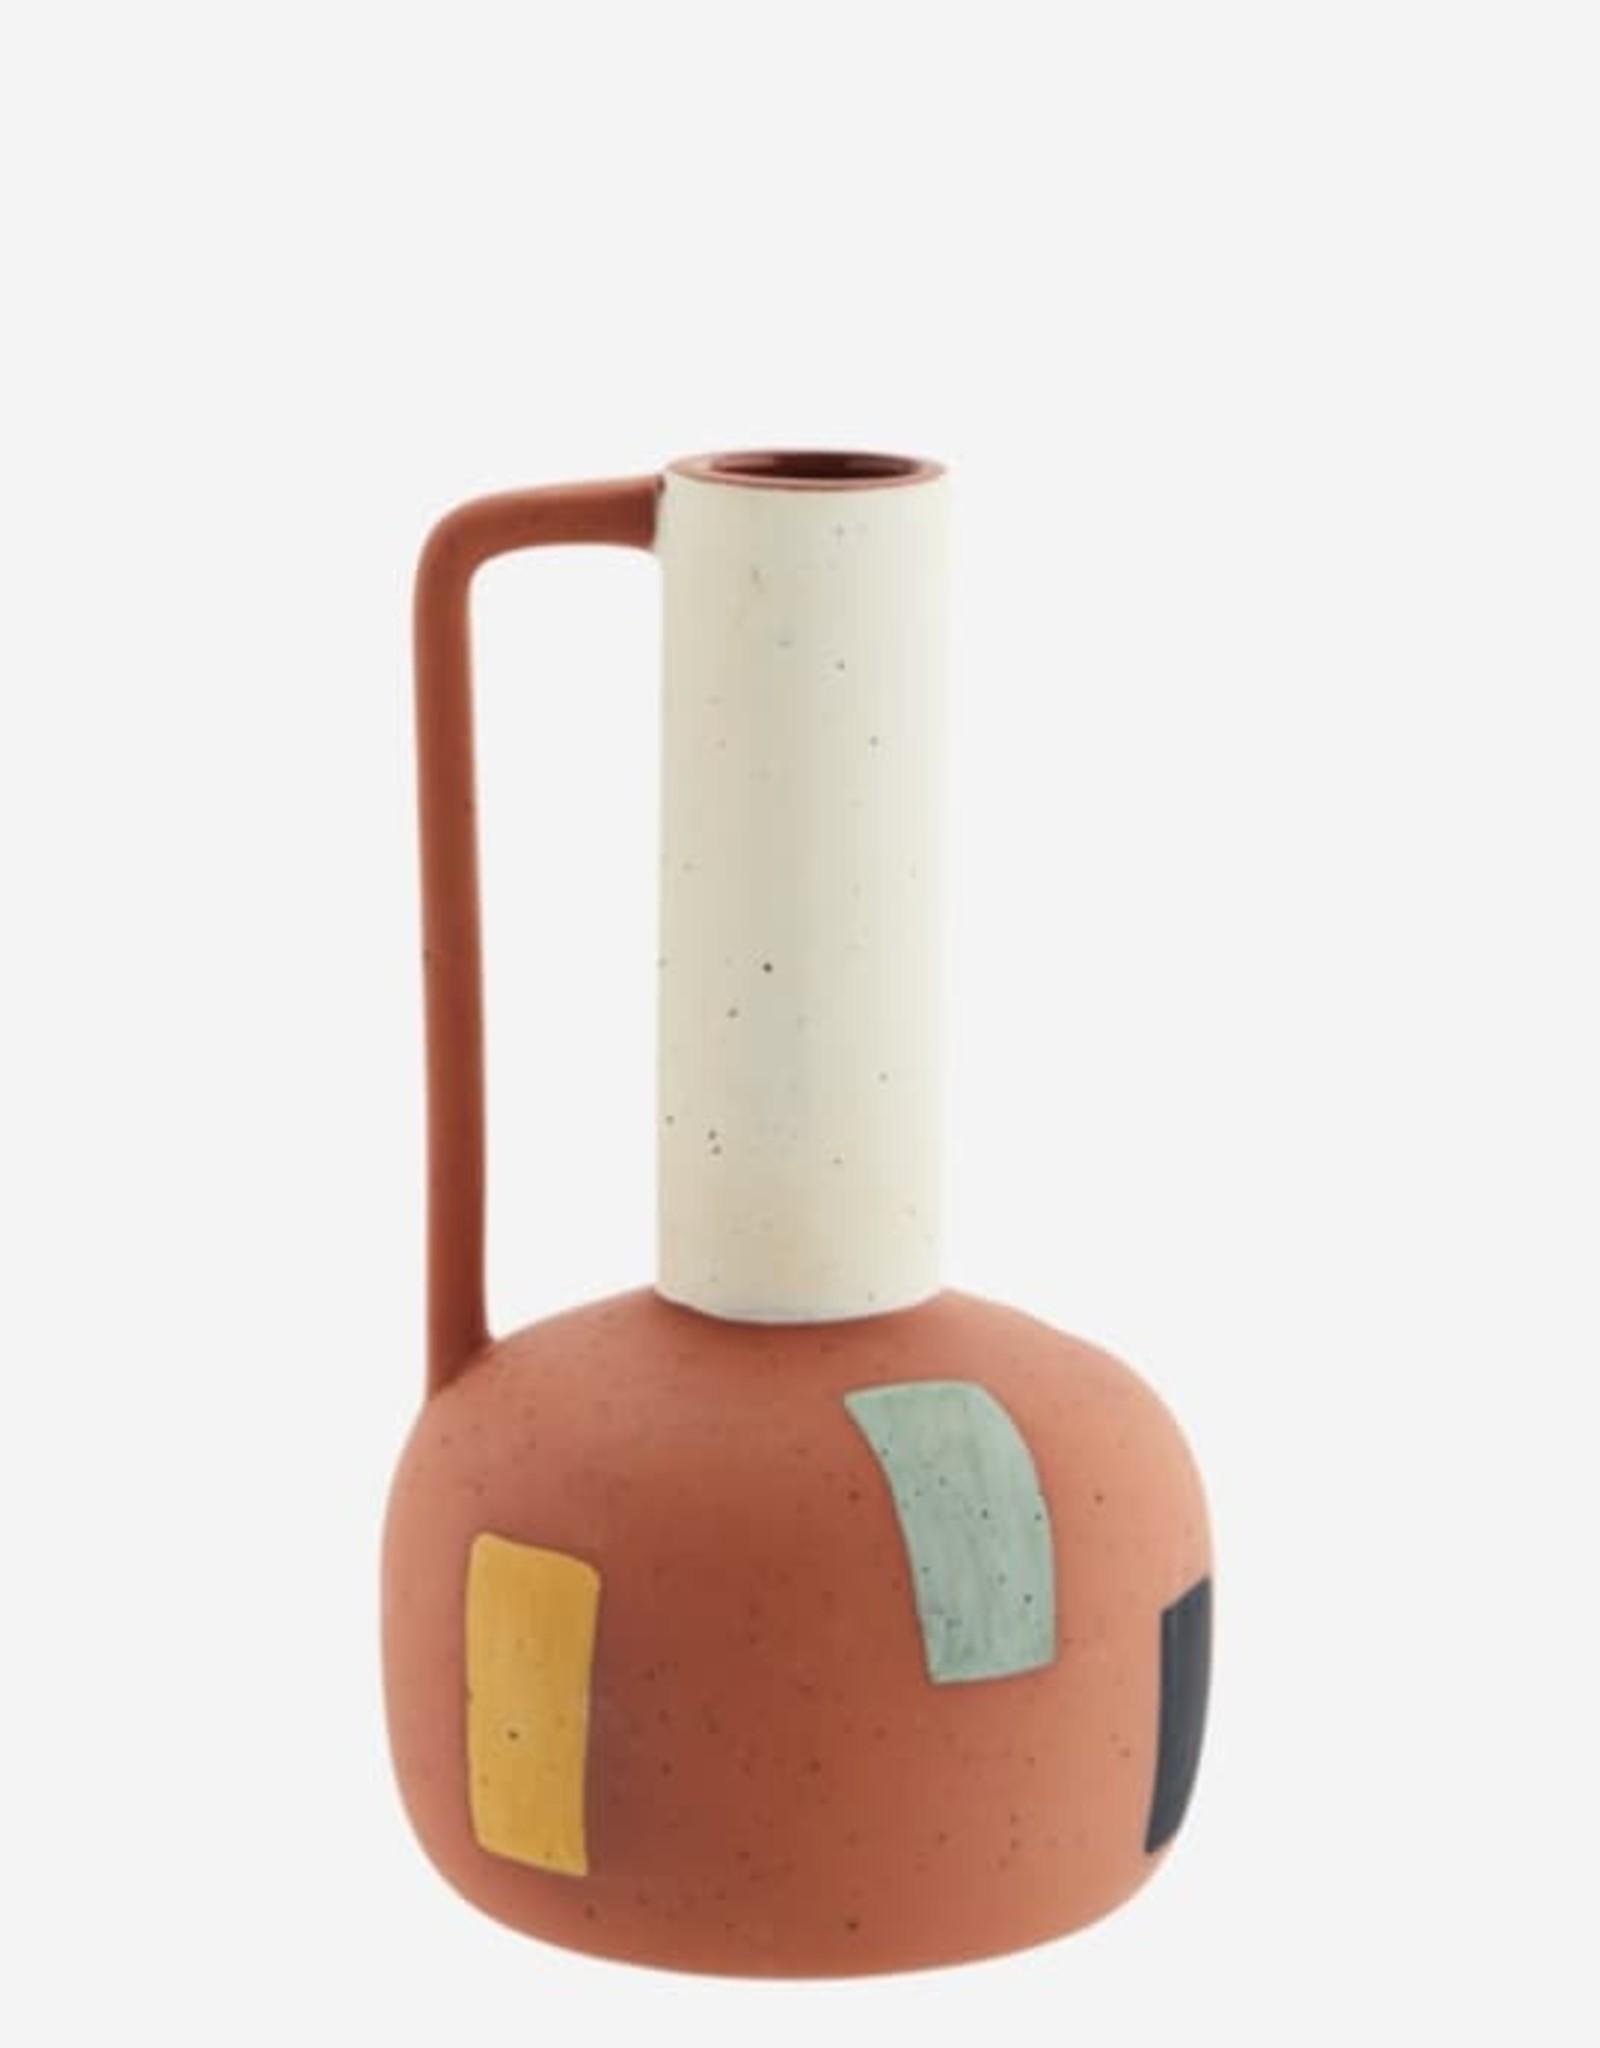 Madam Stoltz Terracotta vaasje met handvat Ø3 h21 cm